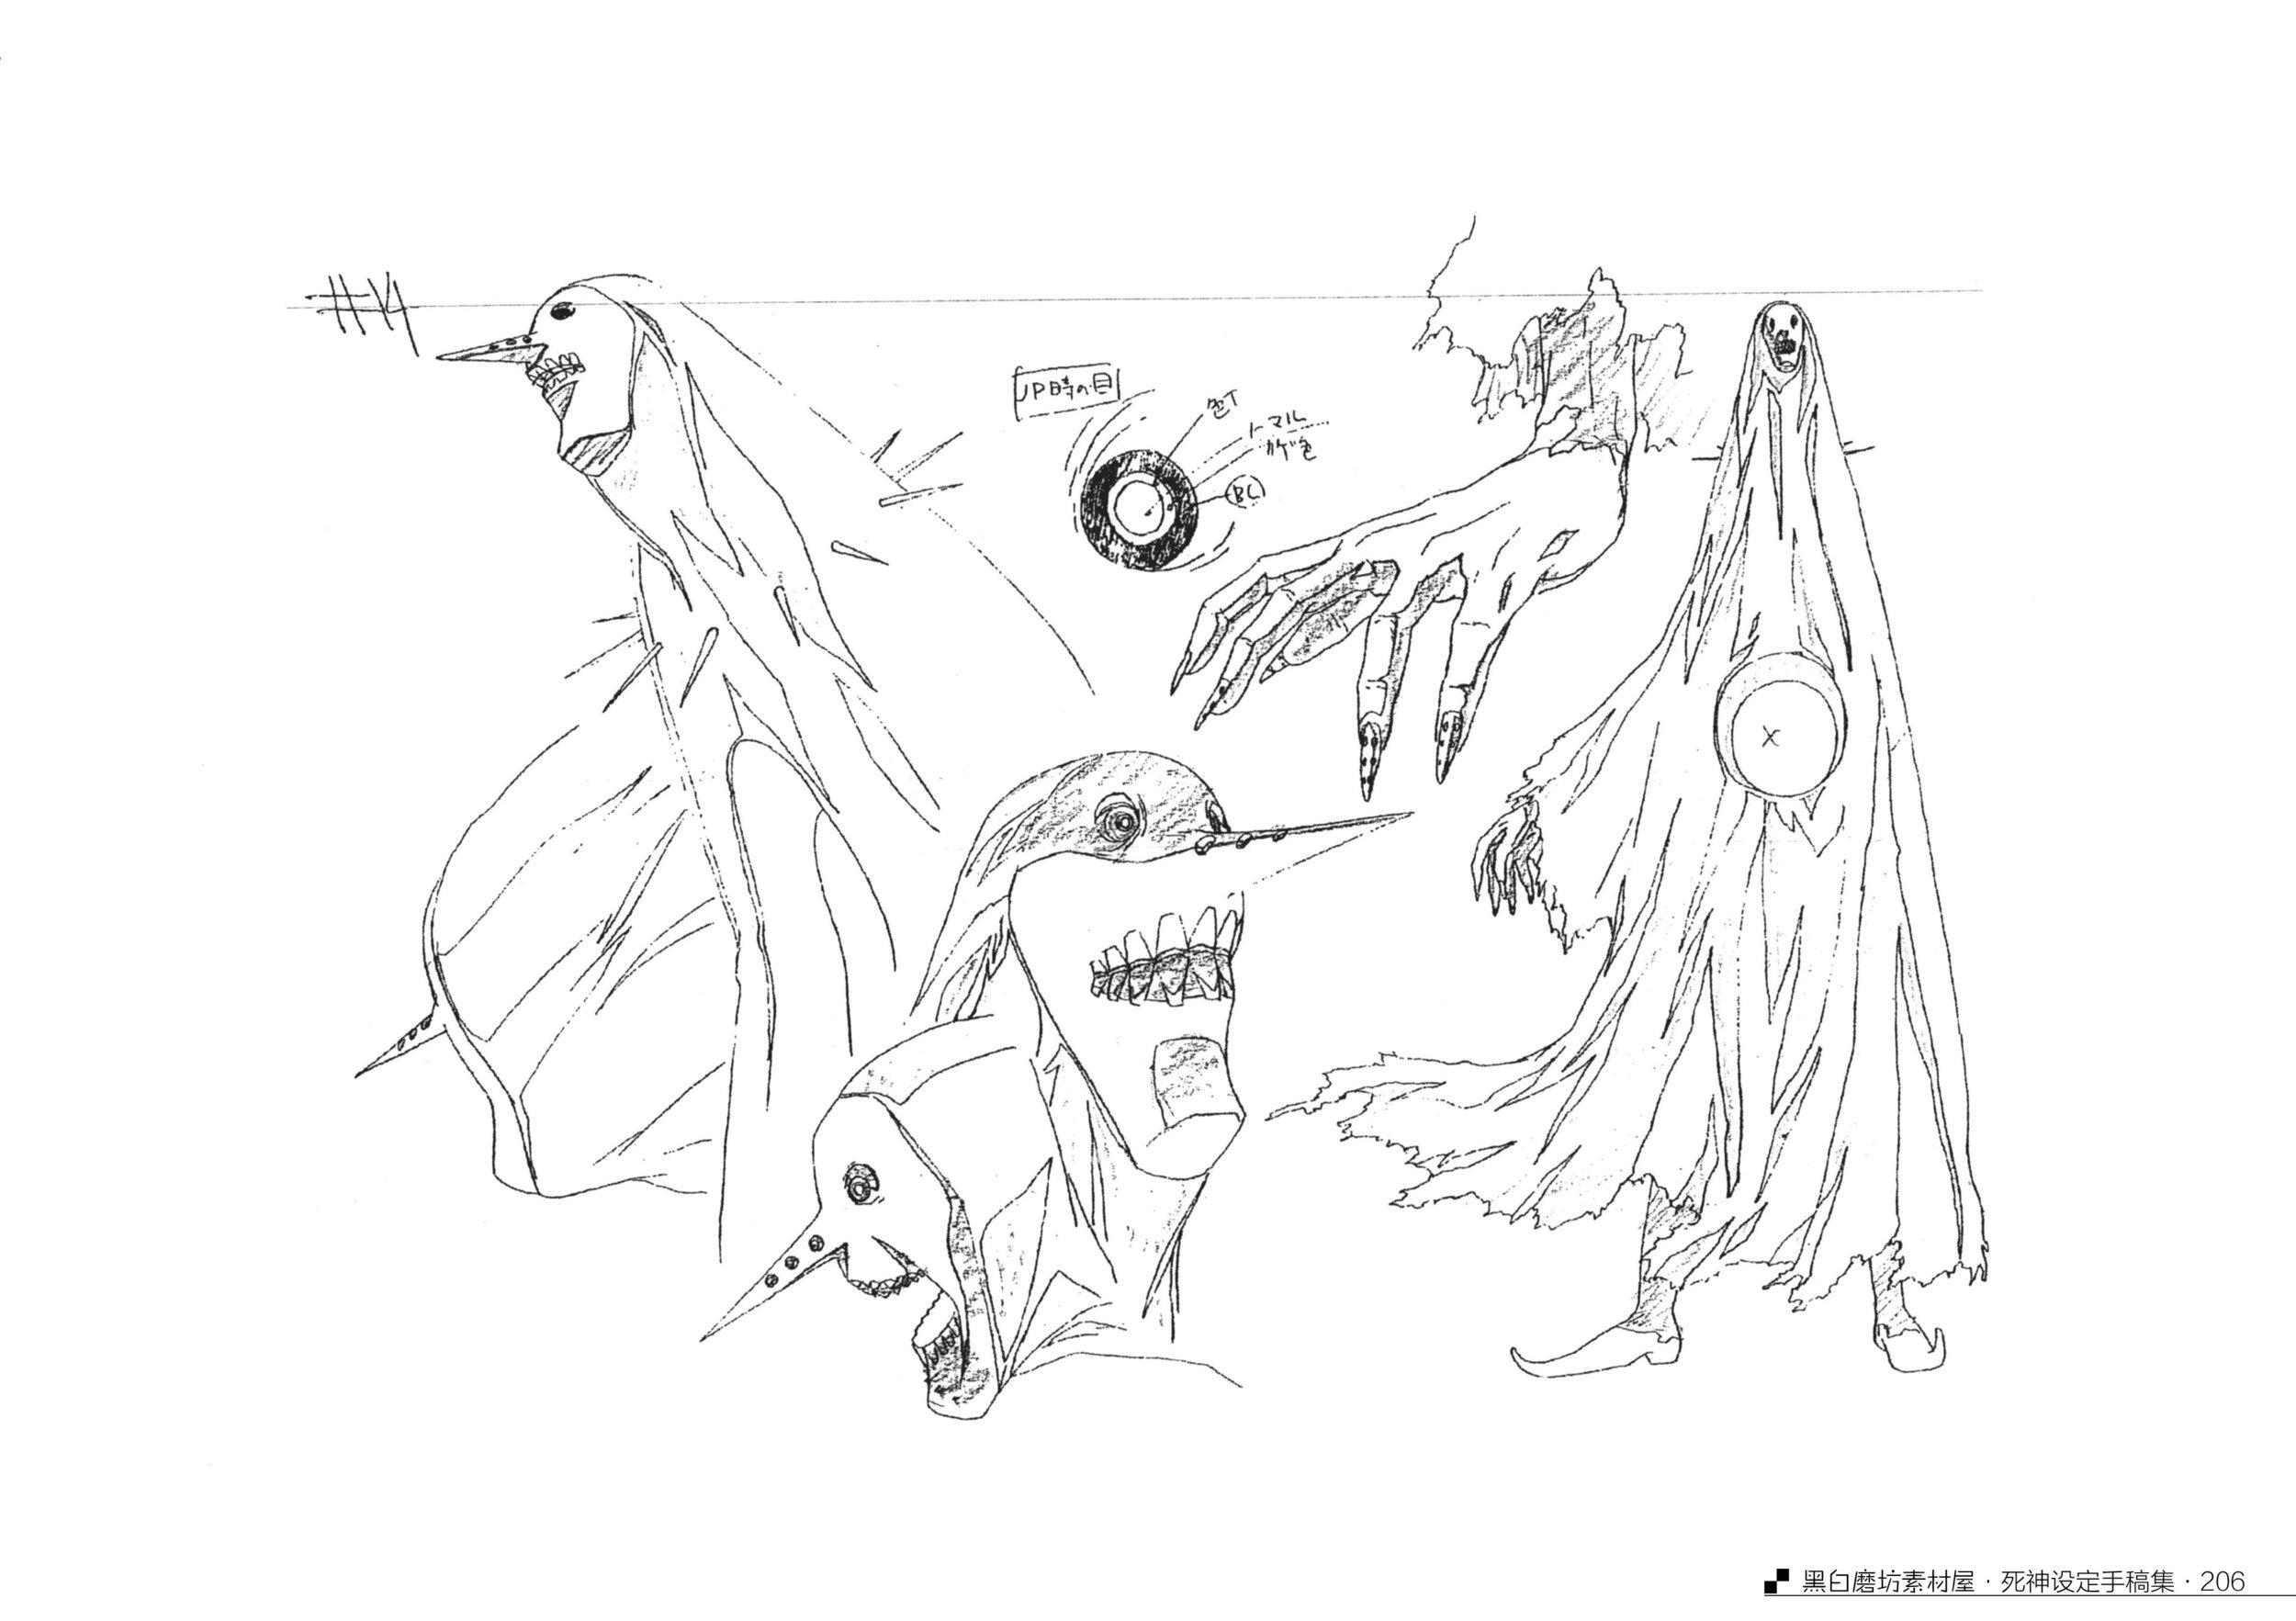 Art of the Bleach A - 184.jpg